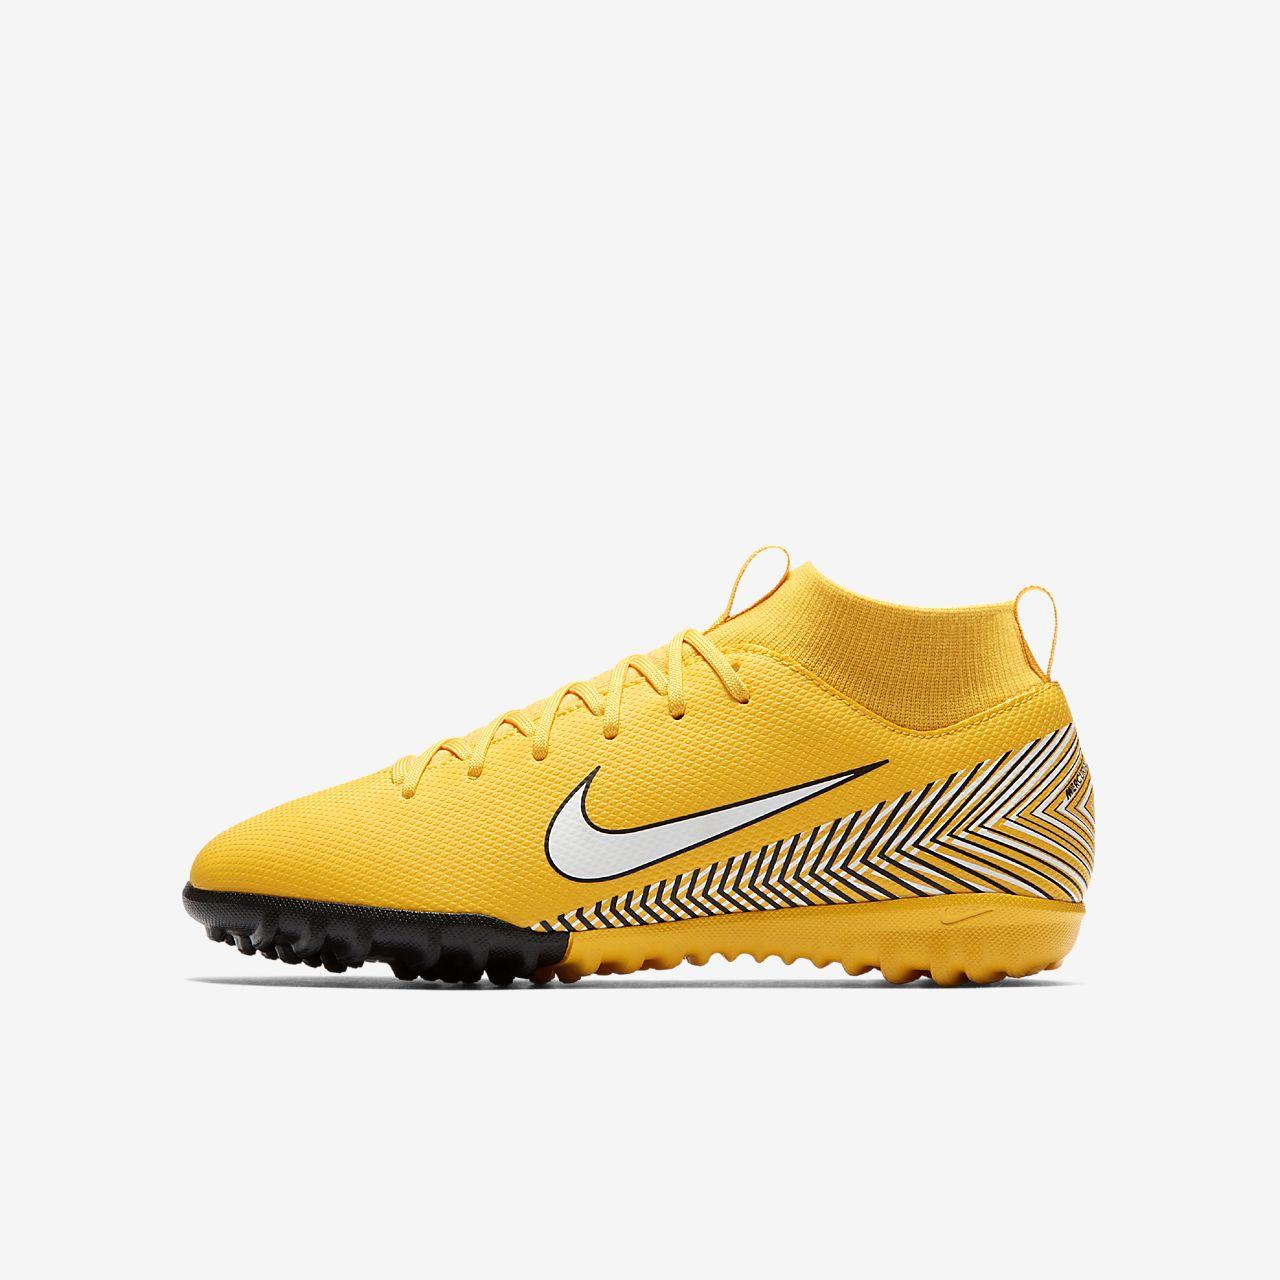 Scarpa da calcio erba per erba calcio sintetica Nike Mercurial Superfly VI 642058